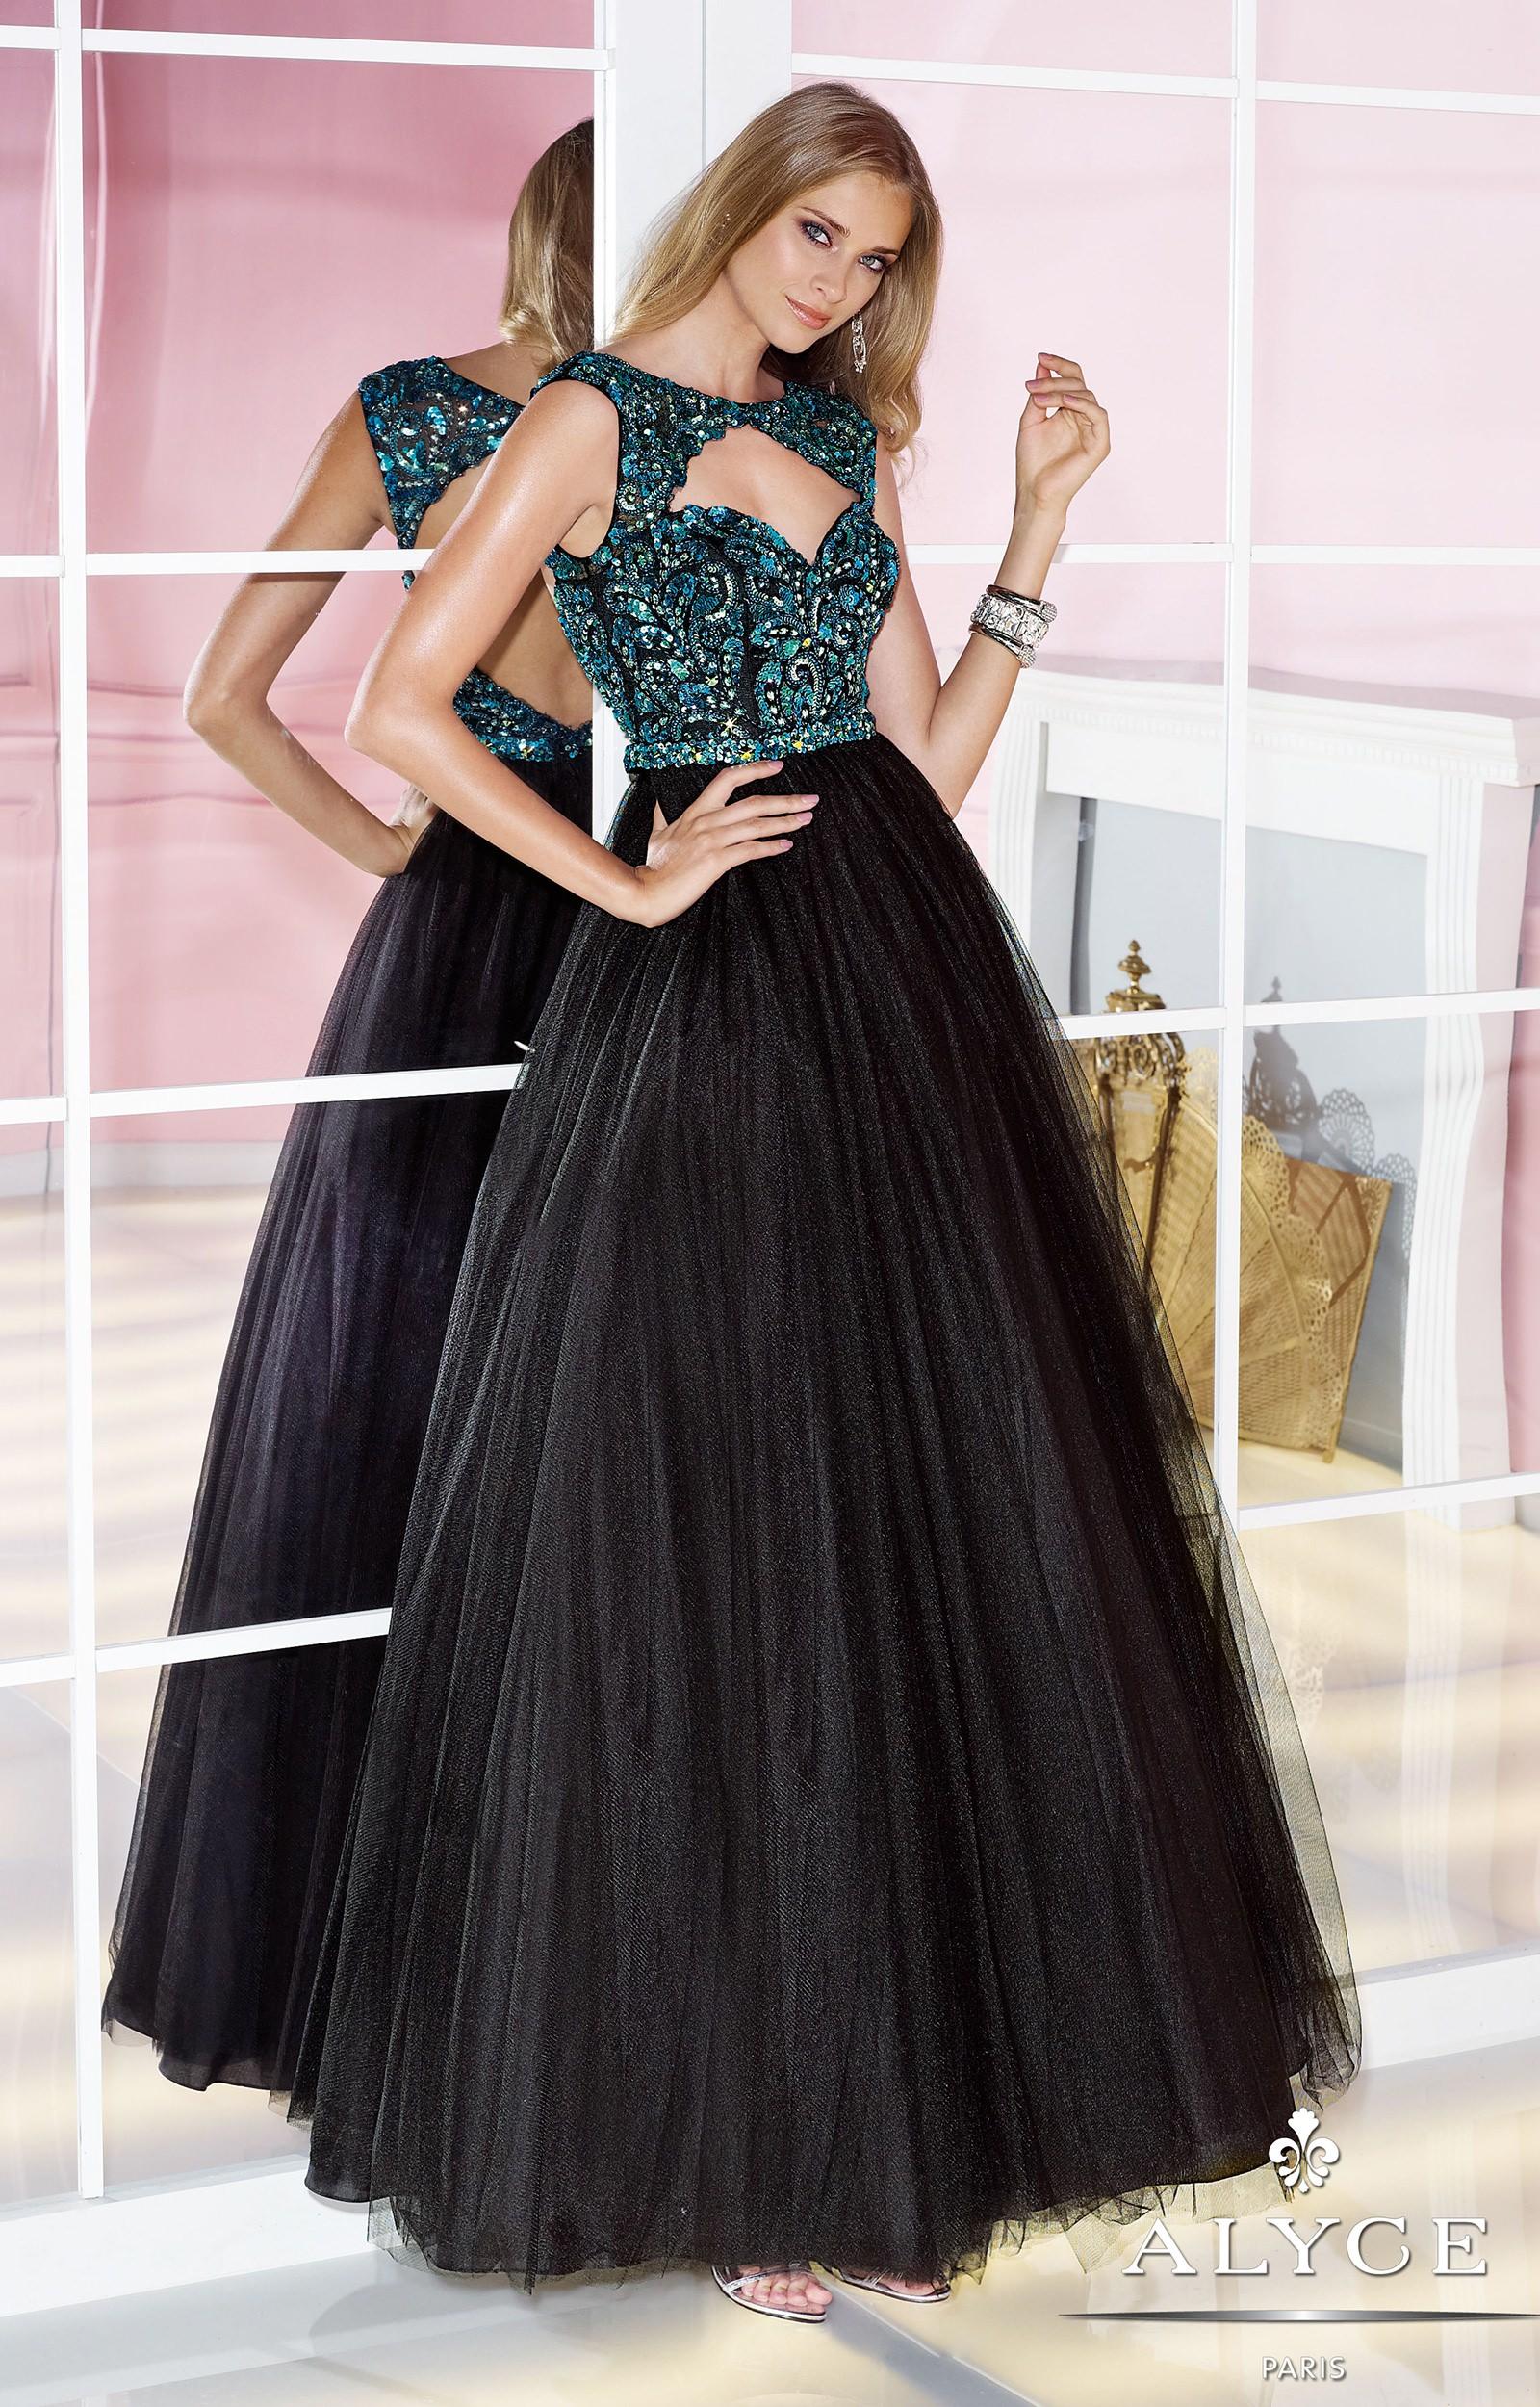 2ba69eb7eab Alyce Paris 6217 - The Bailey Dress Prom Dress